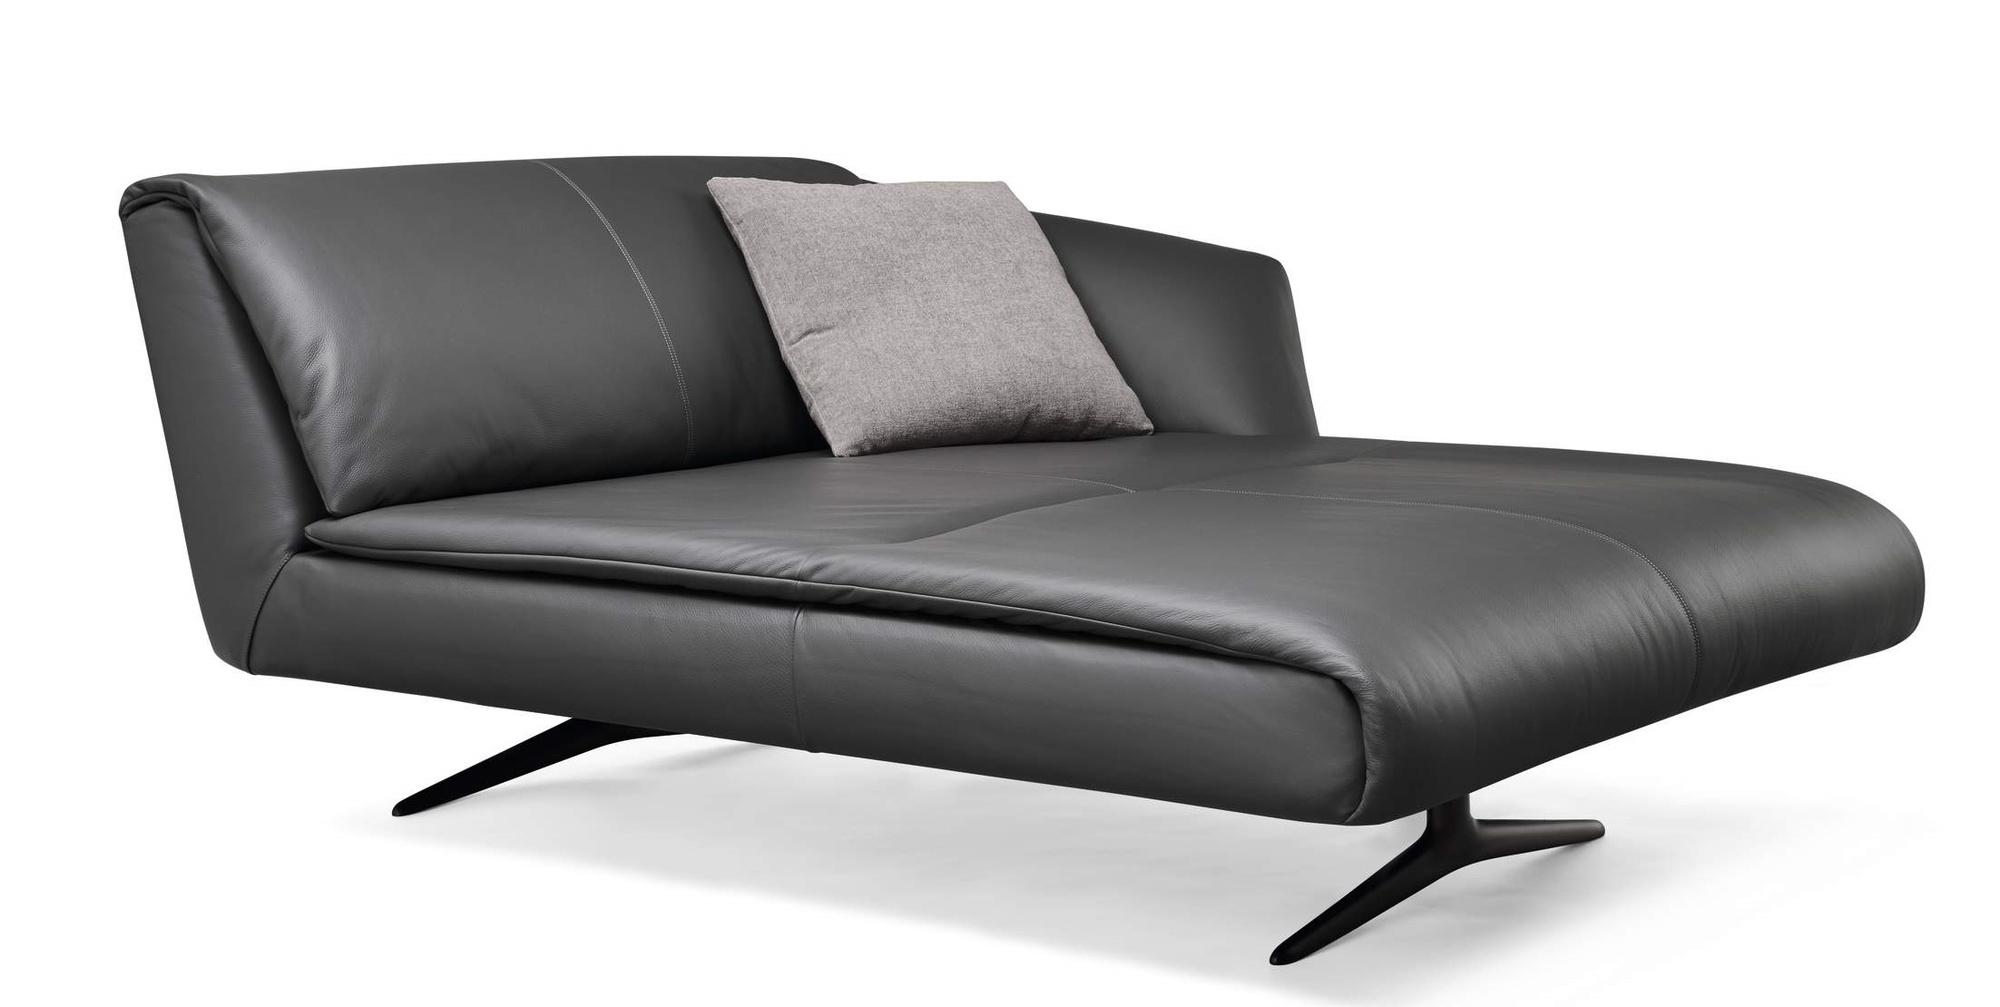 Bundle Freestanding Sofa Walter Knoll